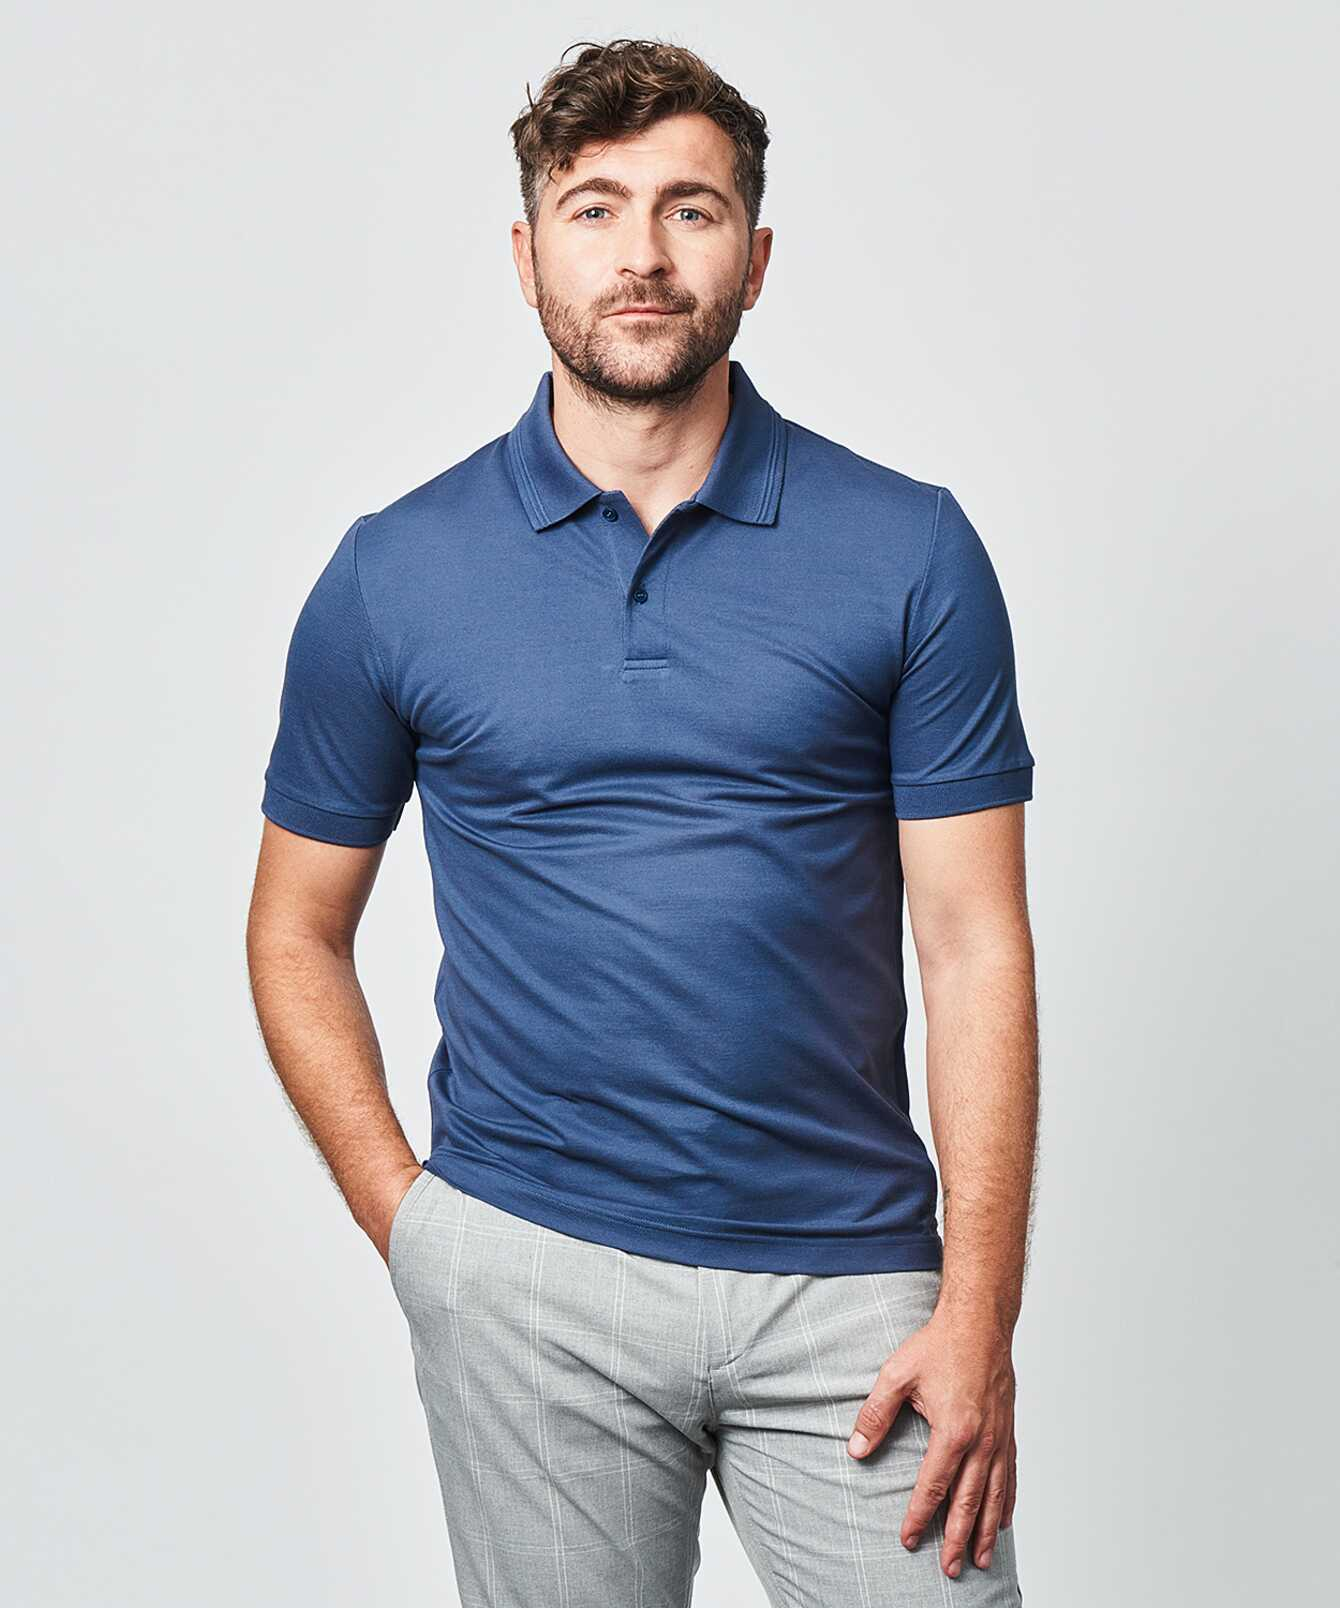 Skjorta Merceriserad Piketröja Blå The Shirt Factory